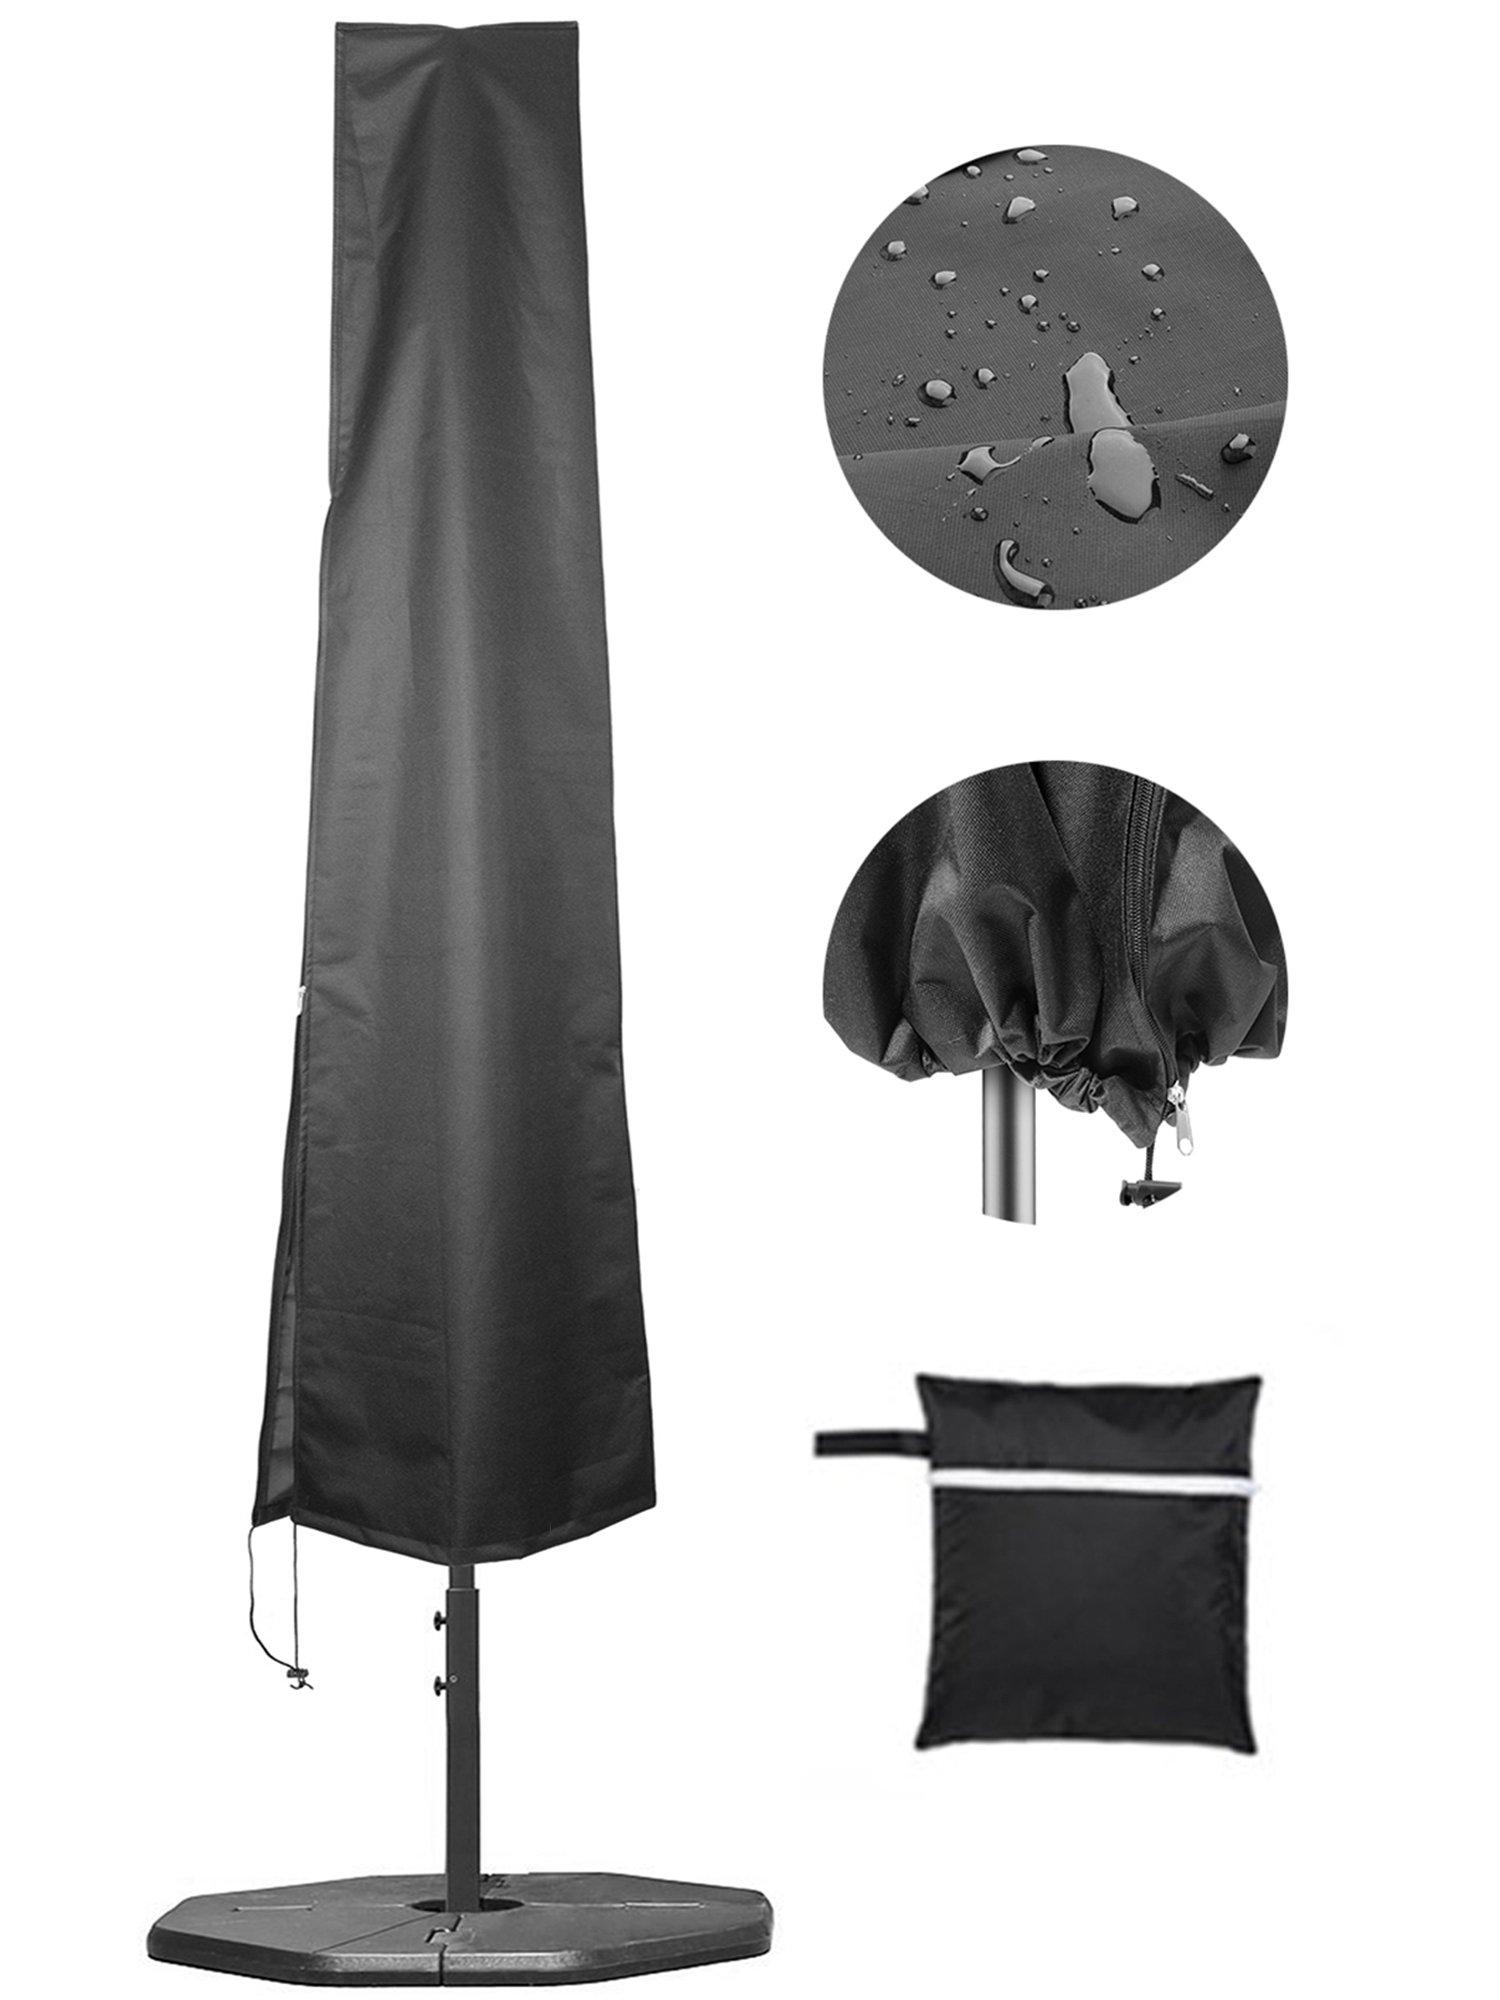 Patio Umbrella Accessories Replacement: Best Rated In Patio Umbrella Covers & Helpful Customer